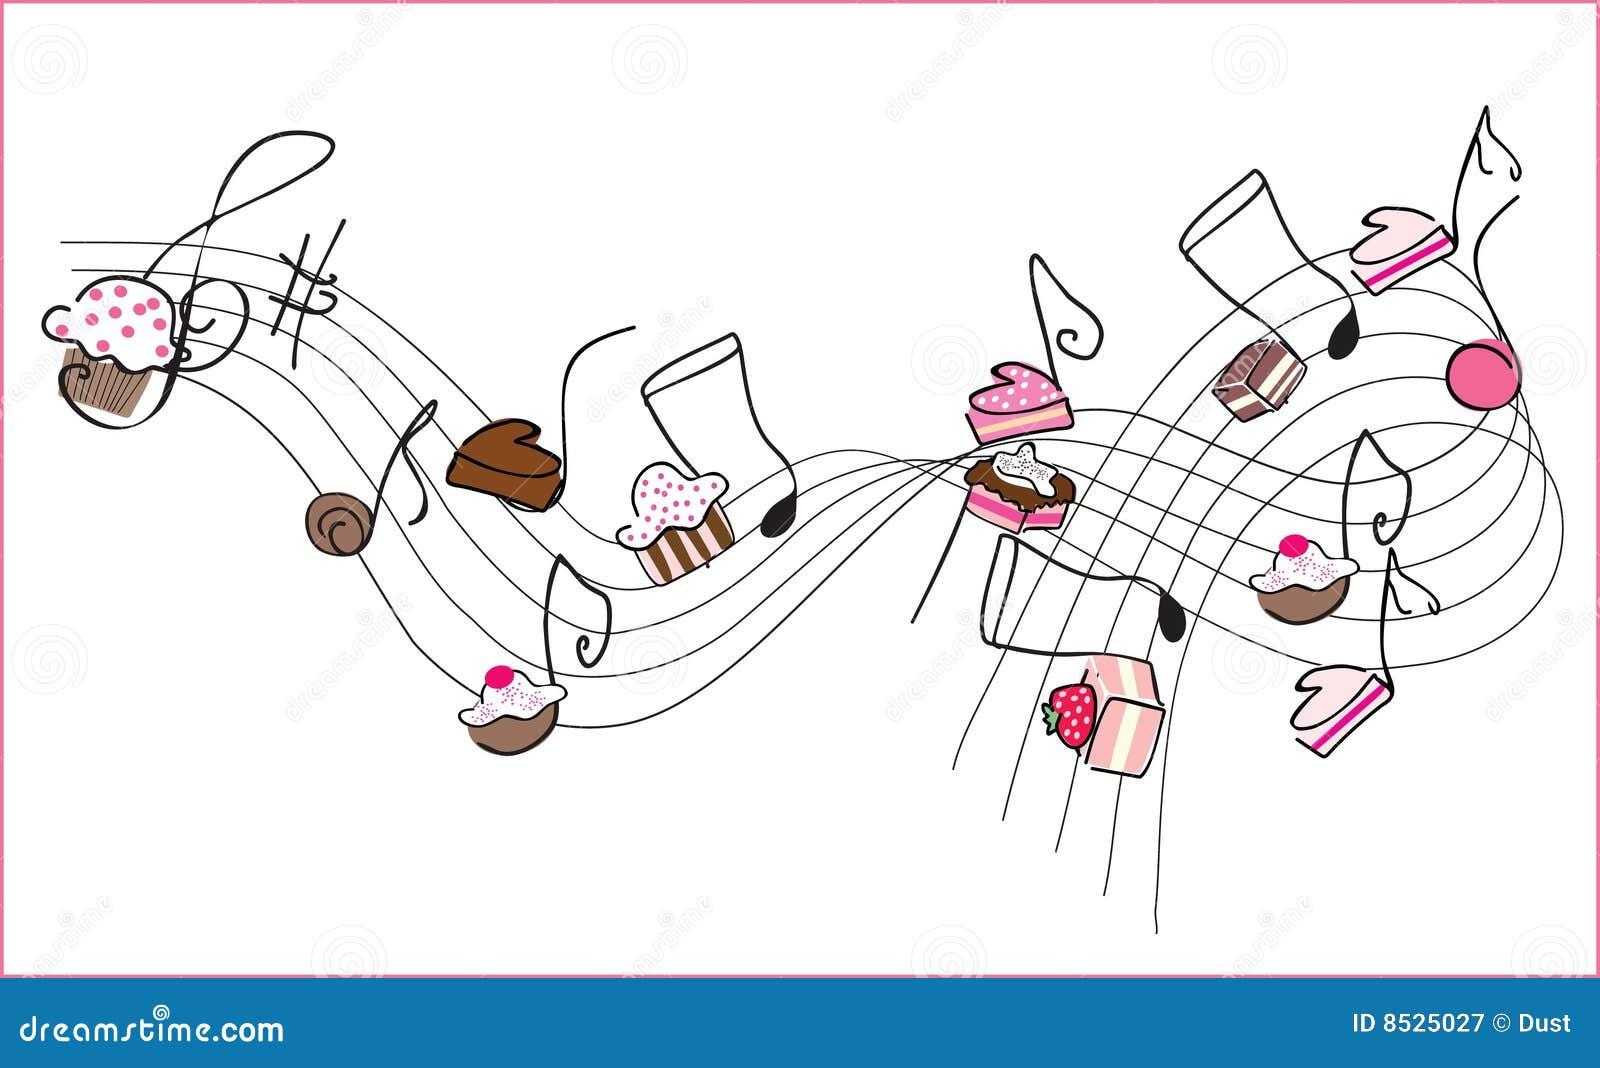 musica music sweet dolce musique douce muziek zoete musik notes note illustration illustrazione dolci libera diritti illustratie pudding douces droits